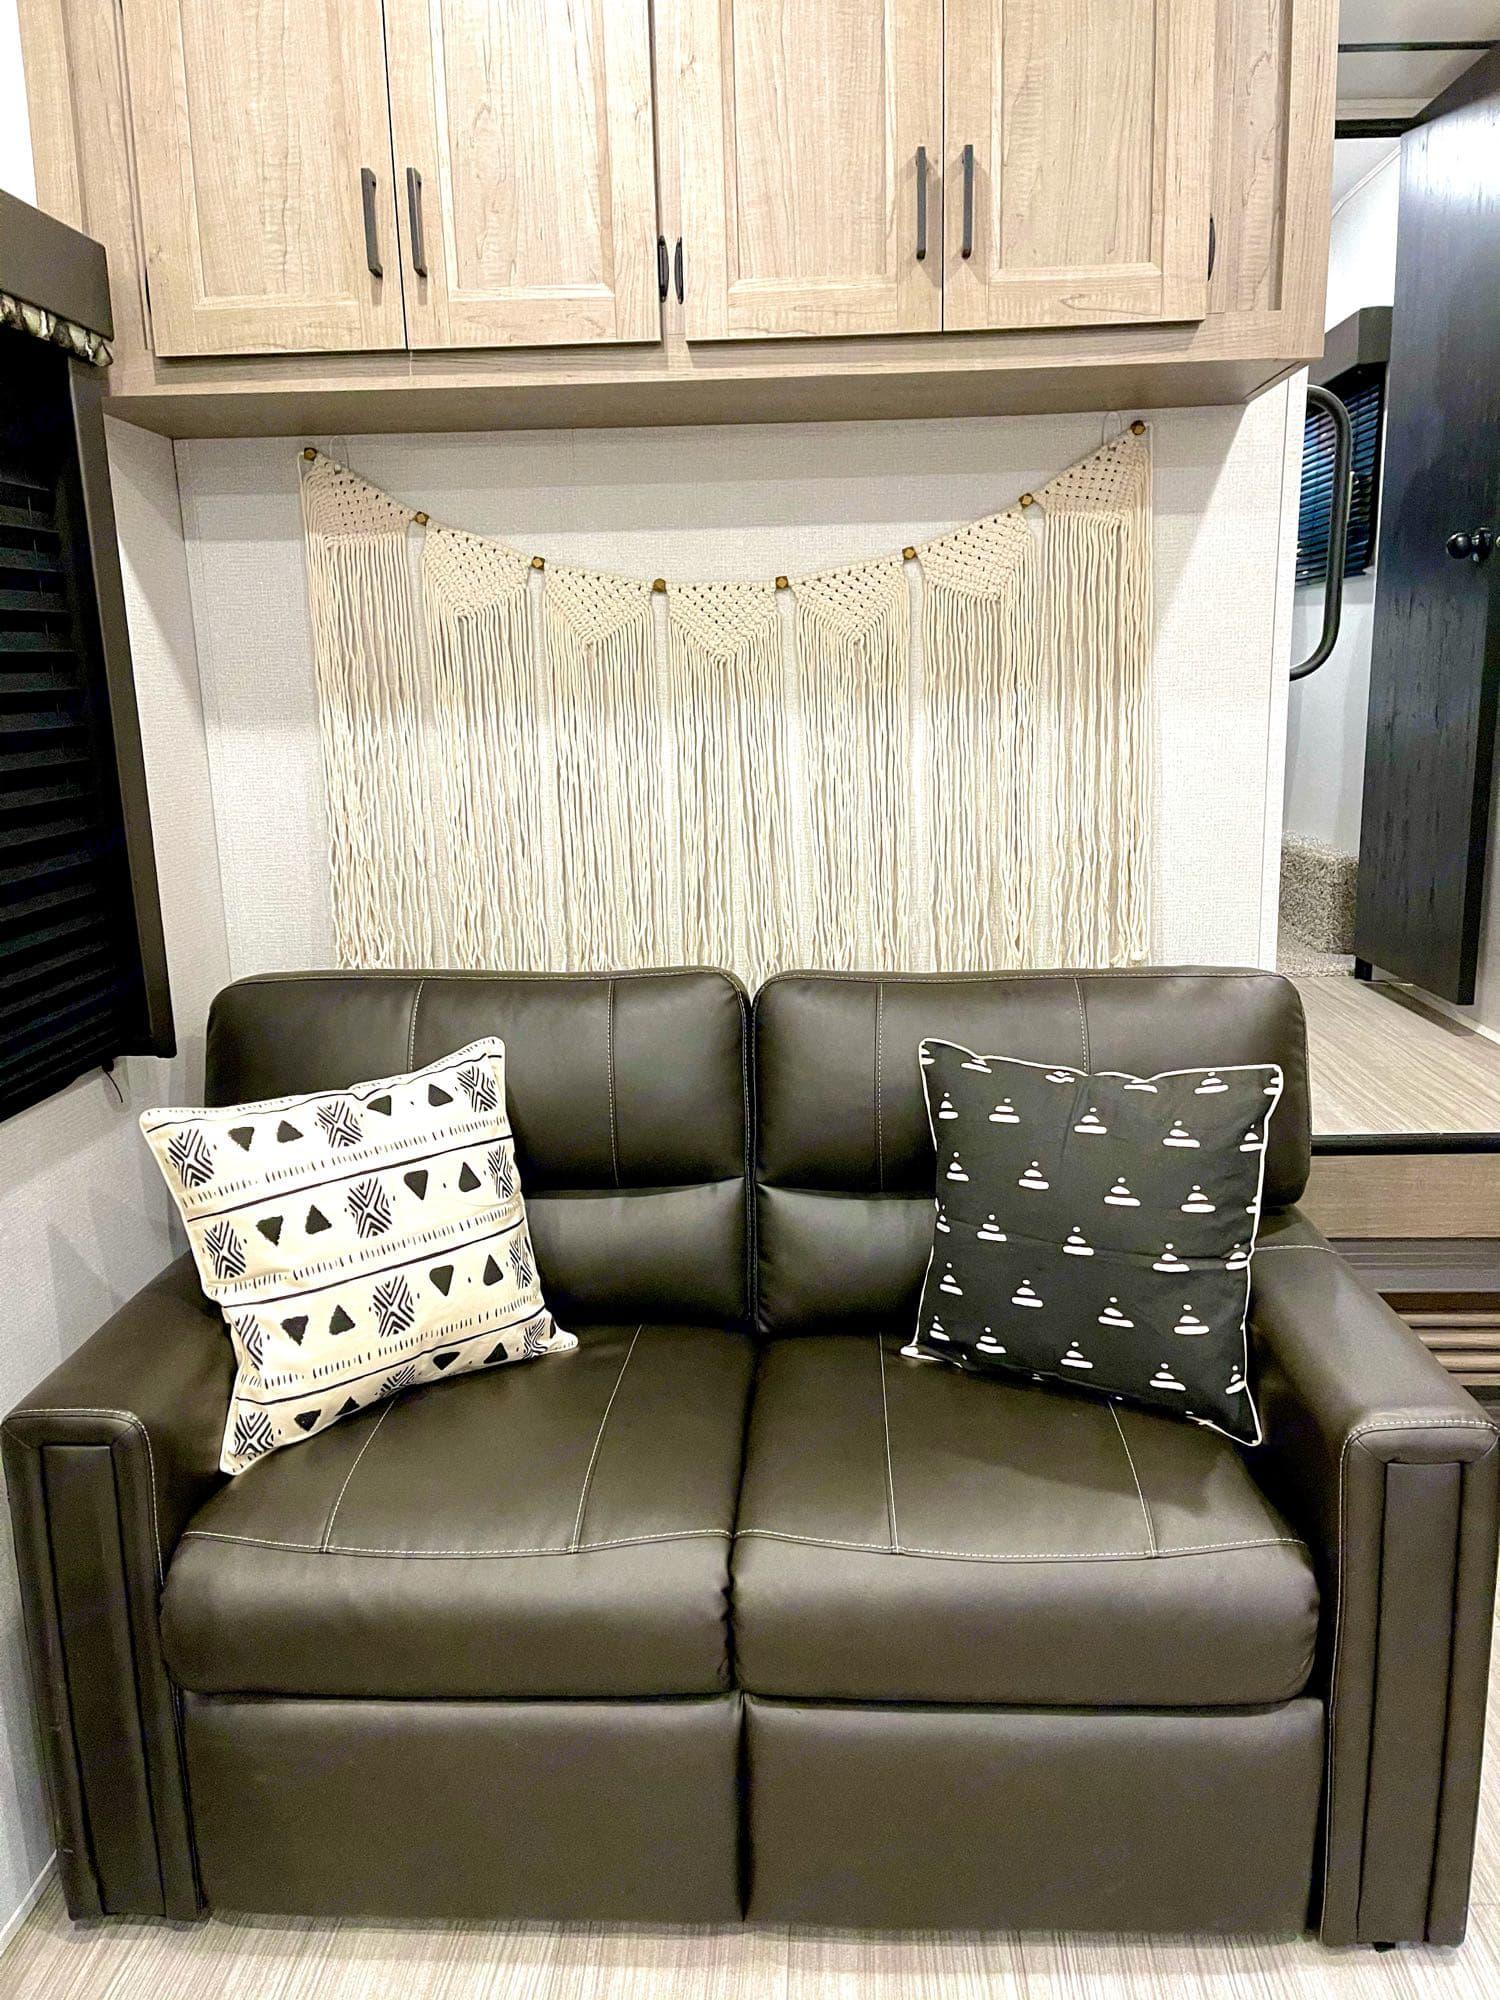 fold out sofa (sleeps 1-2). Keystone Hideout 2020